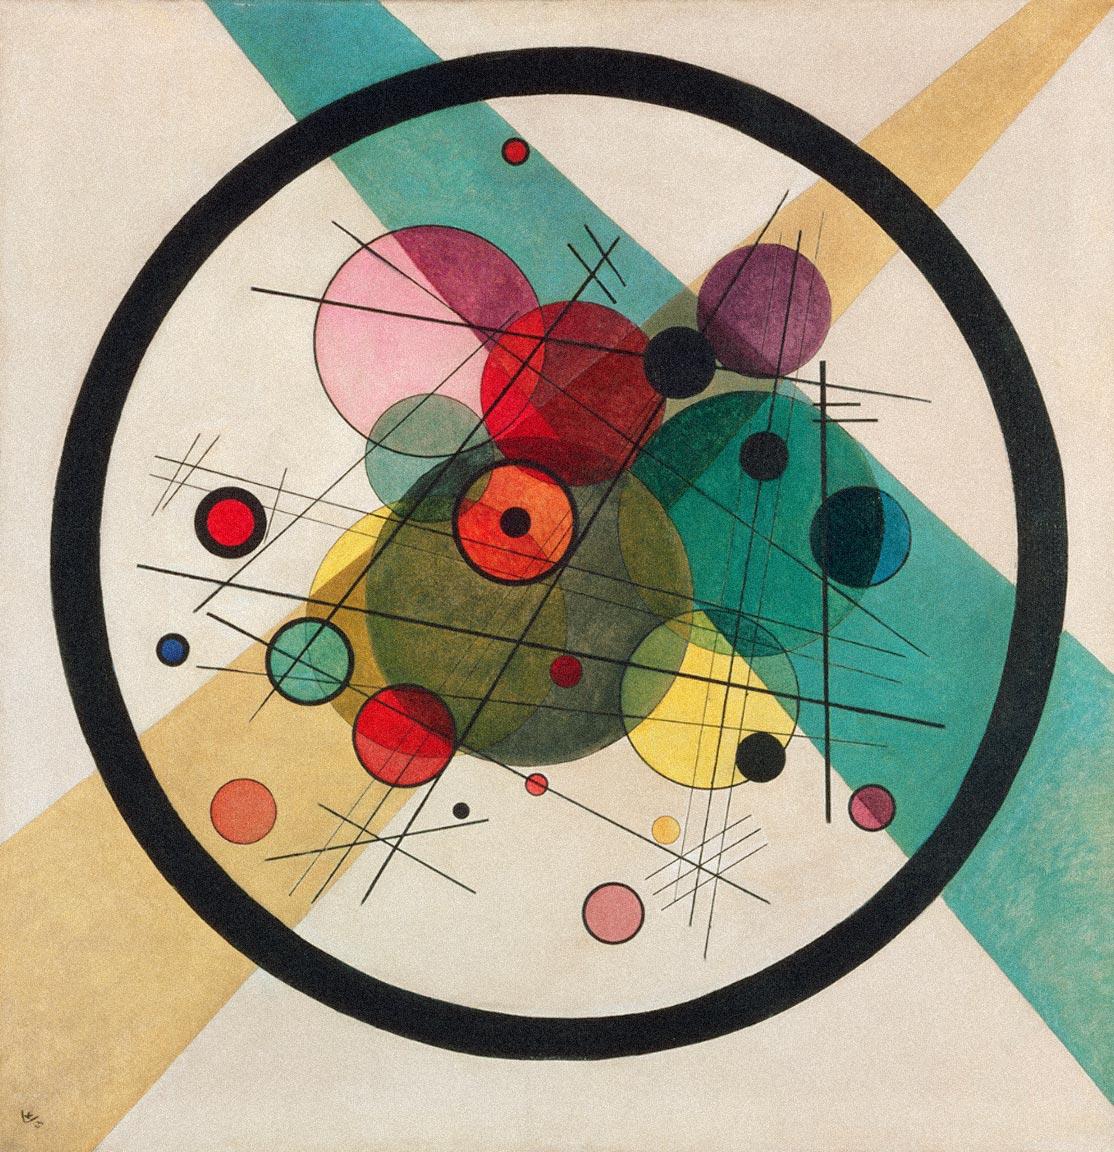 Circles in a Circle  - Wassily Kandinsky, 1923